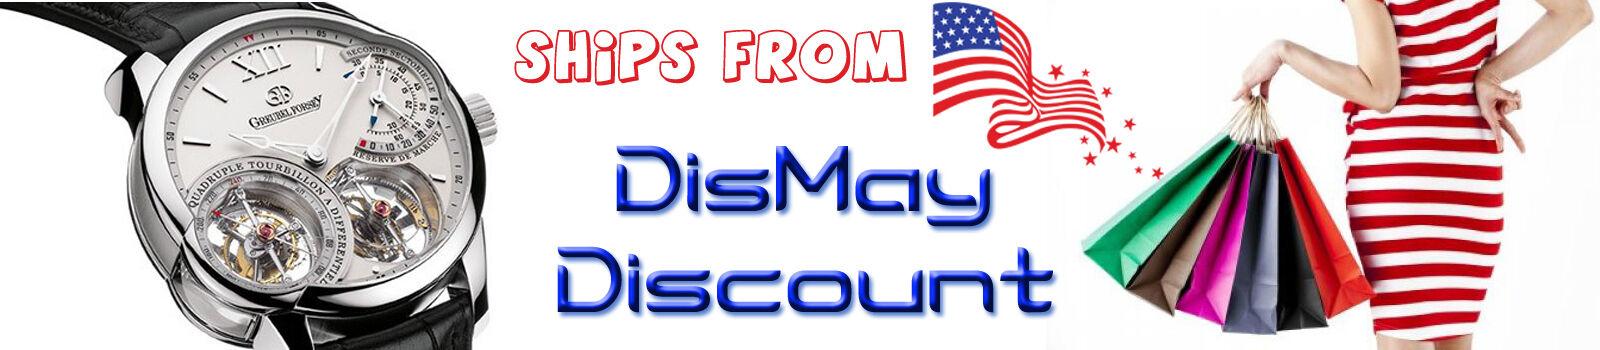 DisMay Discount